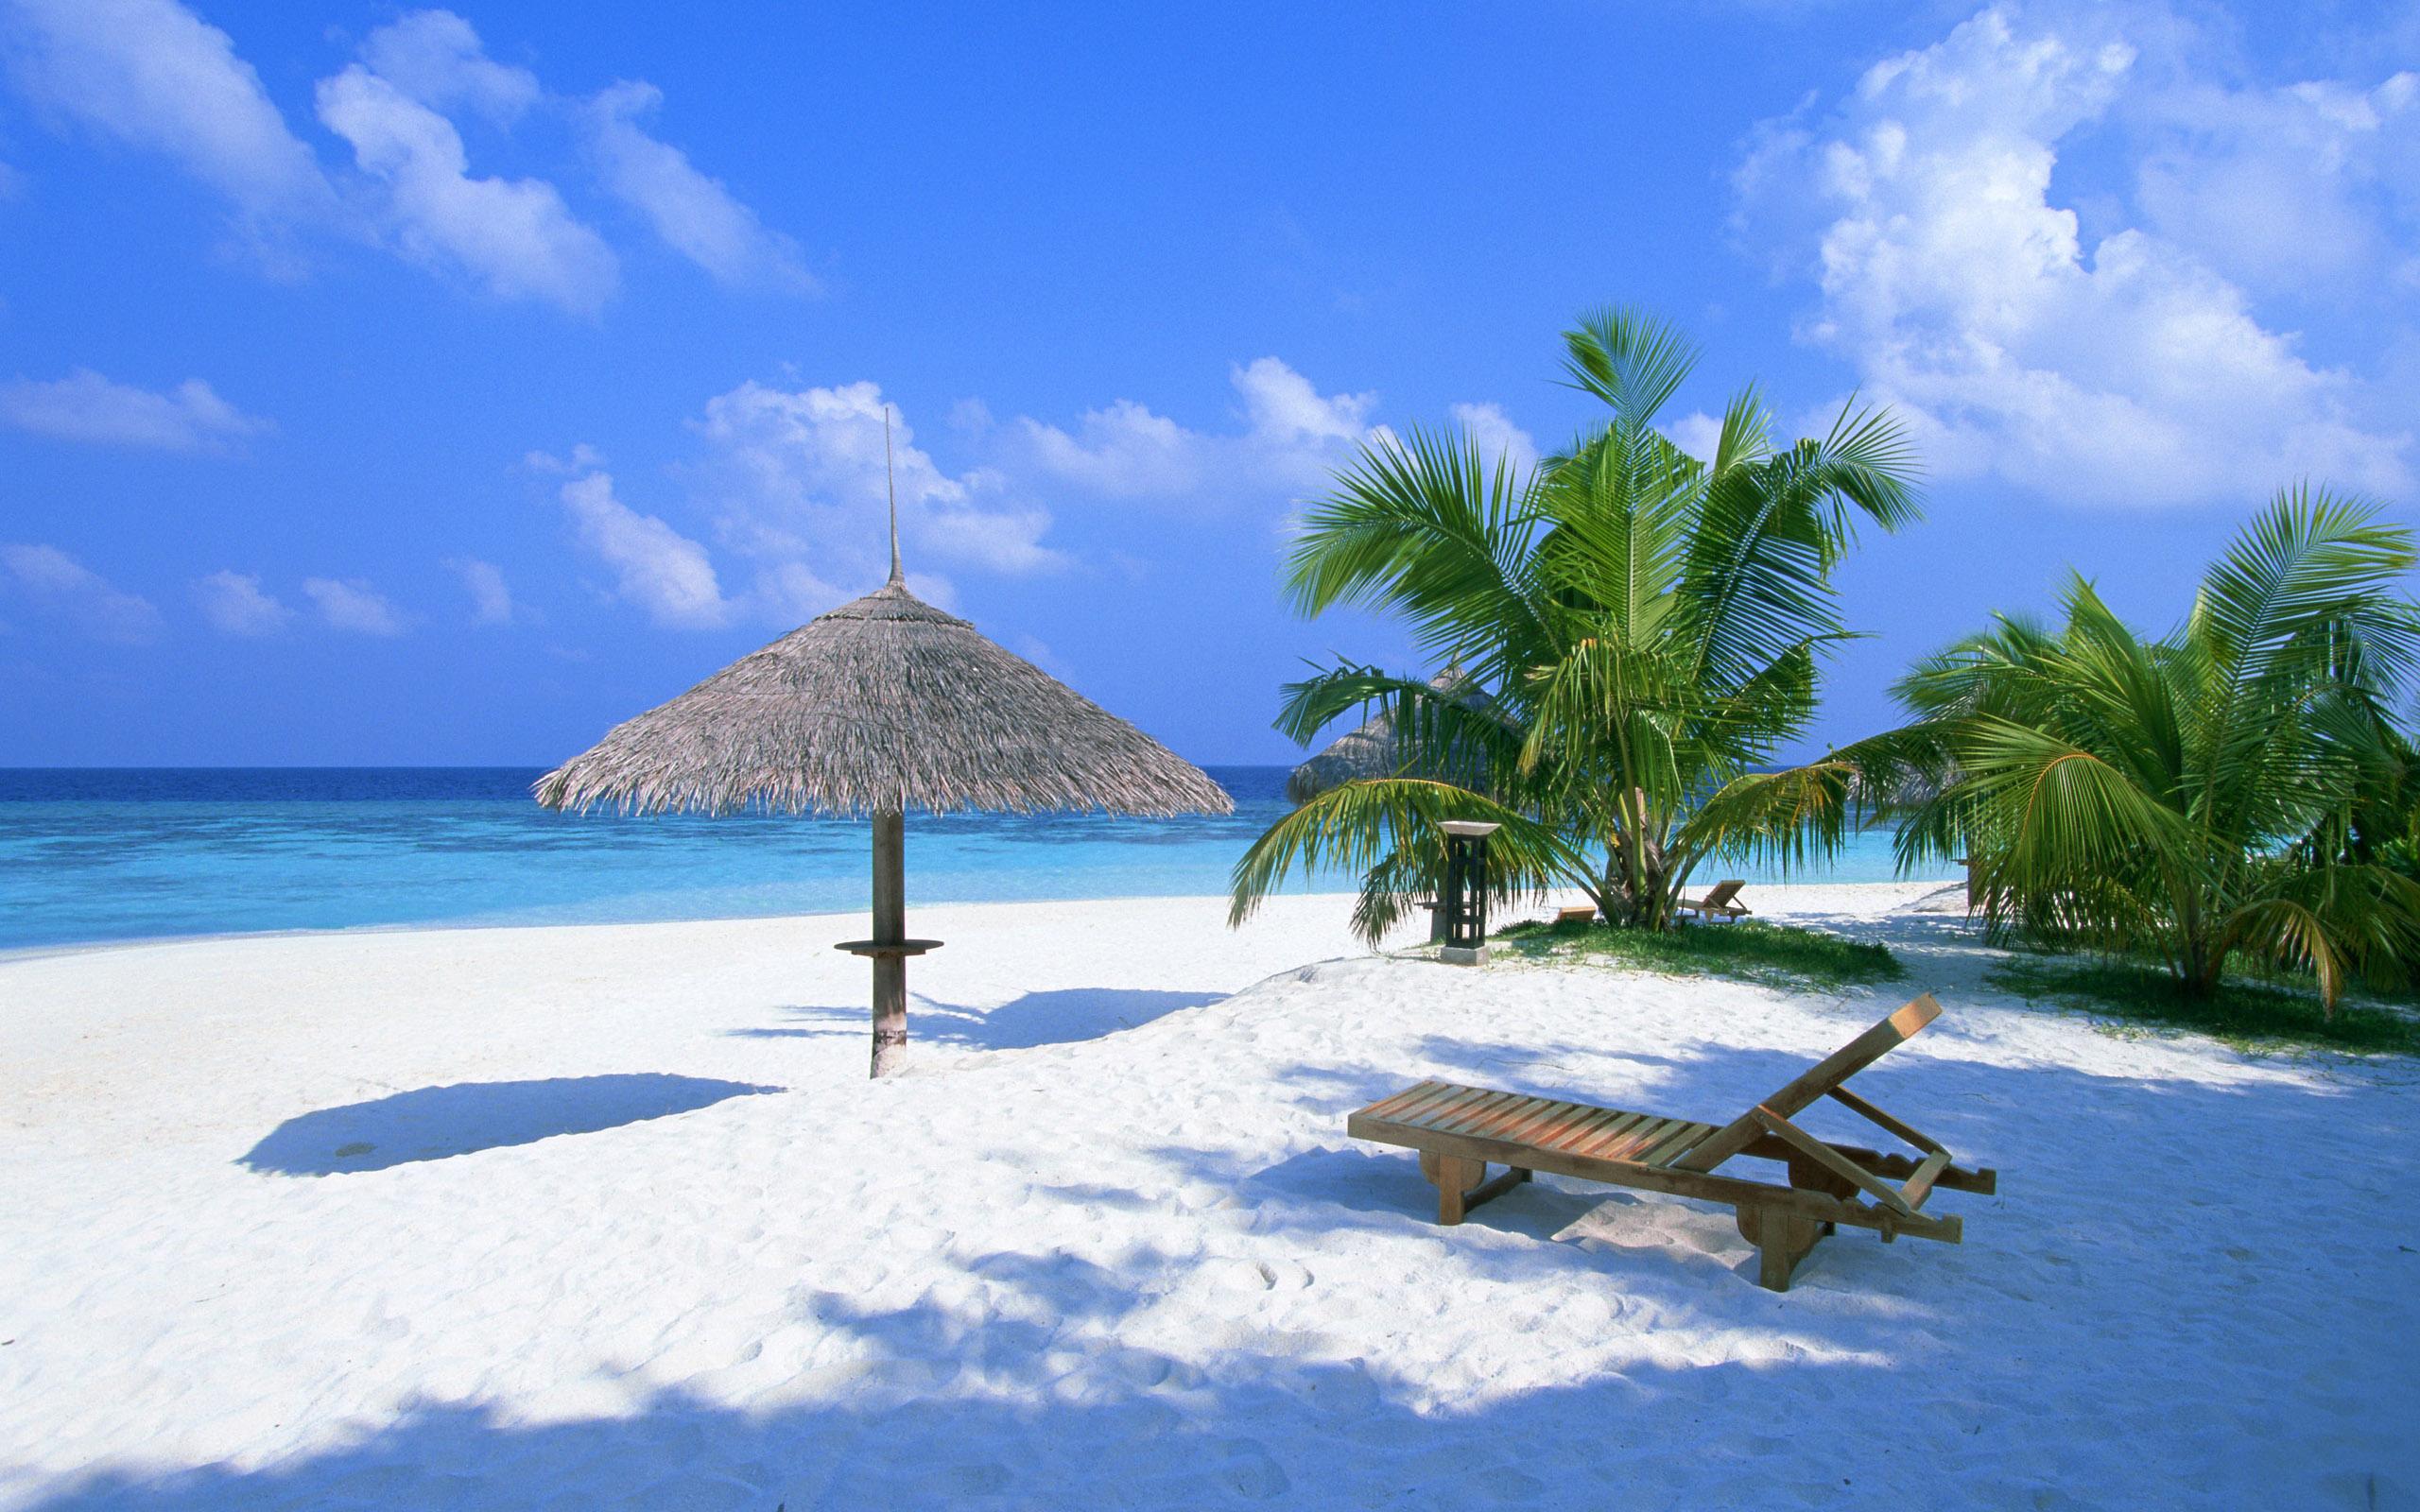 Maldives Paradise Island 2560x1600 HD Wallpapers pack 1   Photo 4 of 2560x1600